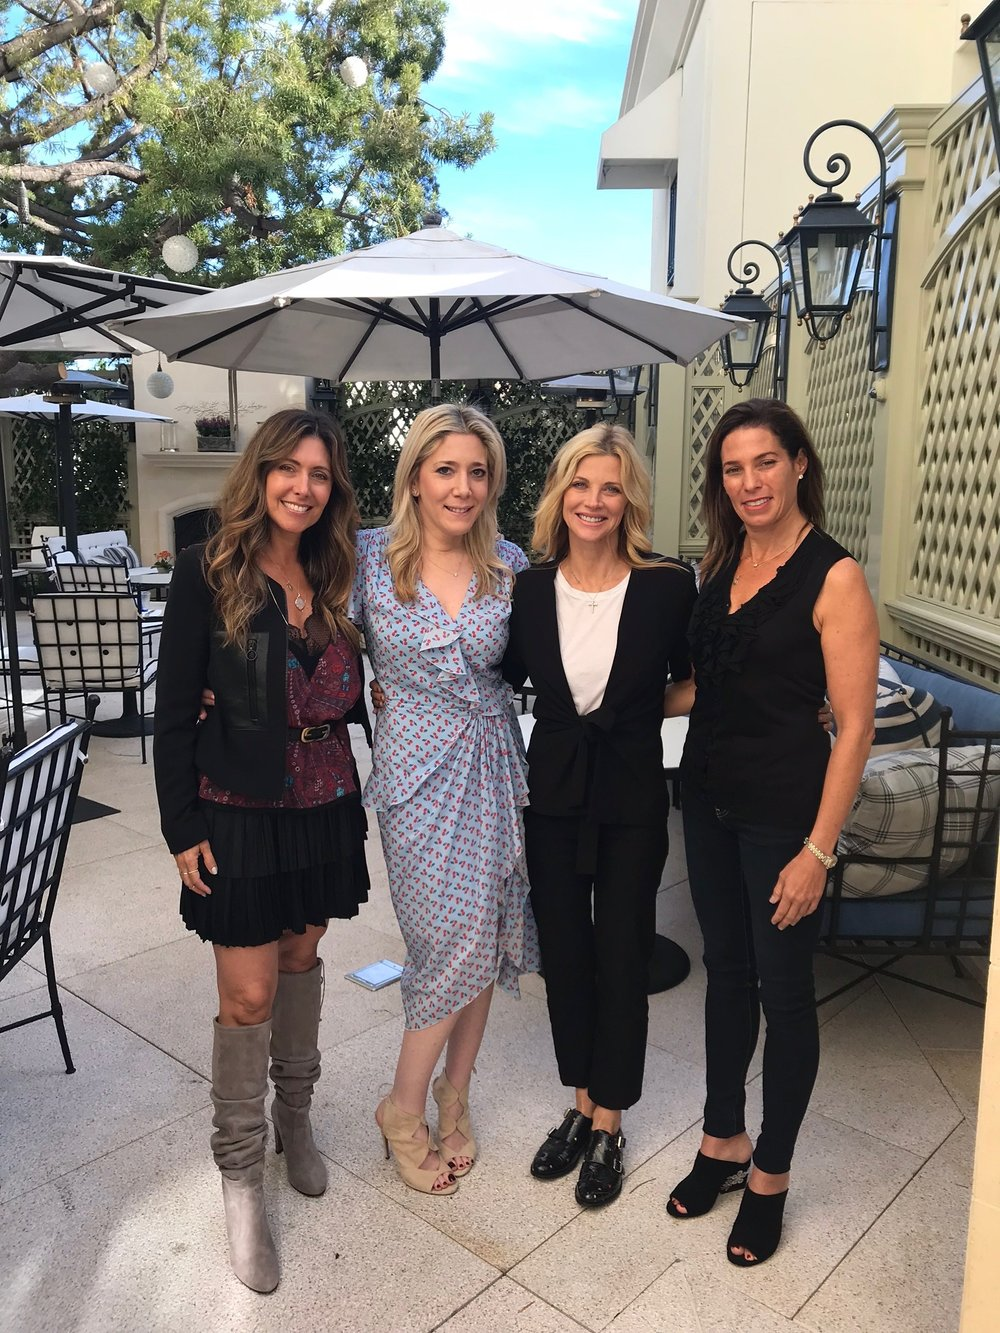 Melissa Breitbart, Janet Gunn, Deborah Galant